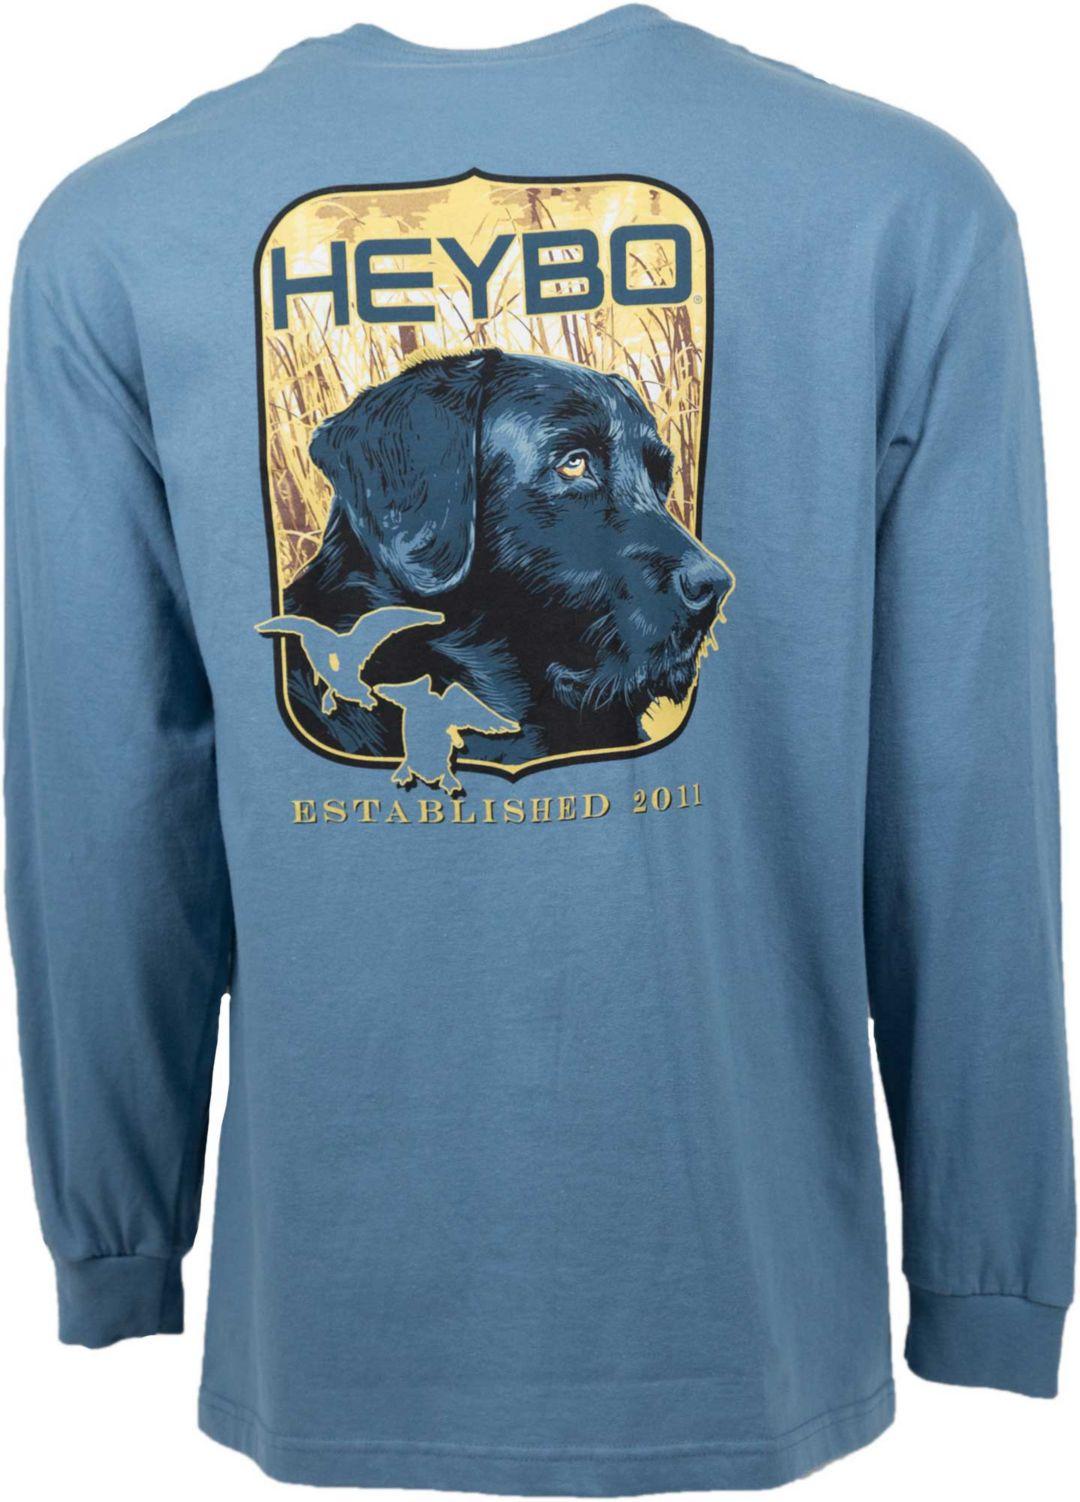 6f0ac8418 Heybo Men's Ol' Blue Long Sleeve T-Shirt | Field & Stream